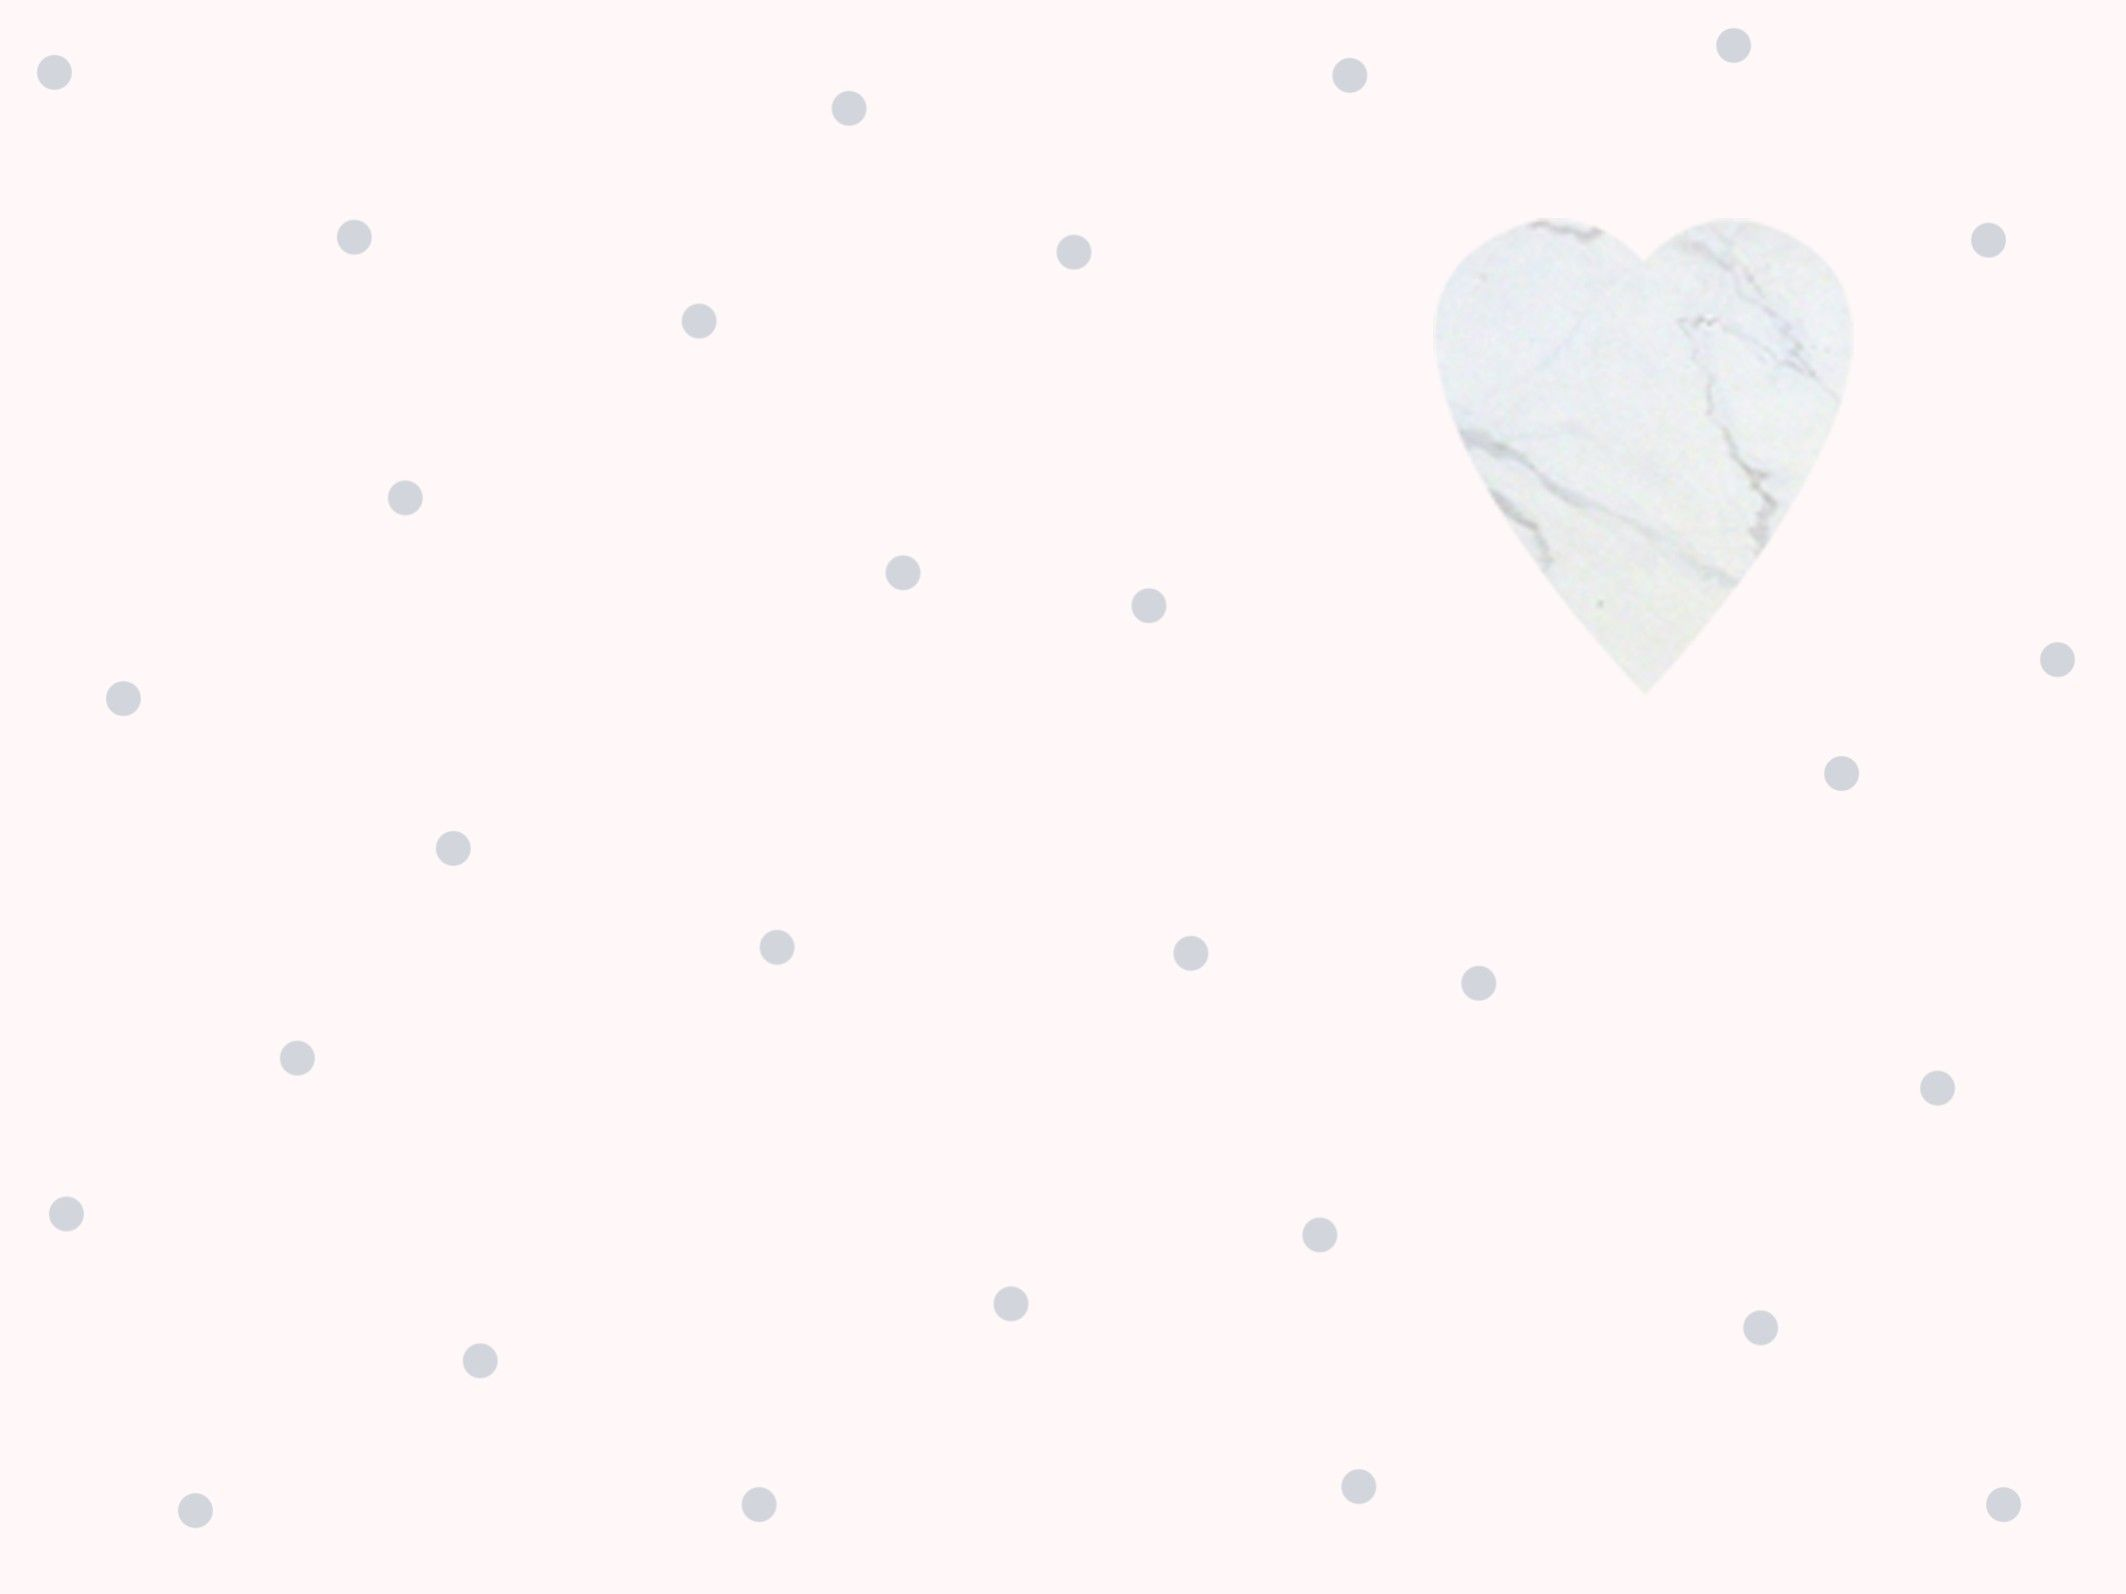 Wonderful Wallpaper Marble Heart - 1fe85e91bbd1efe31ab79efa0e718053  Pic_633583.jpg